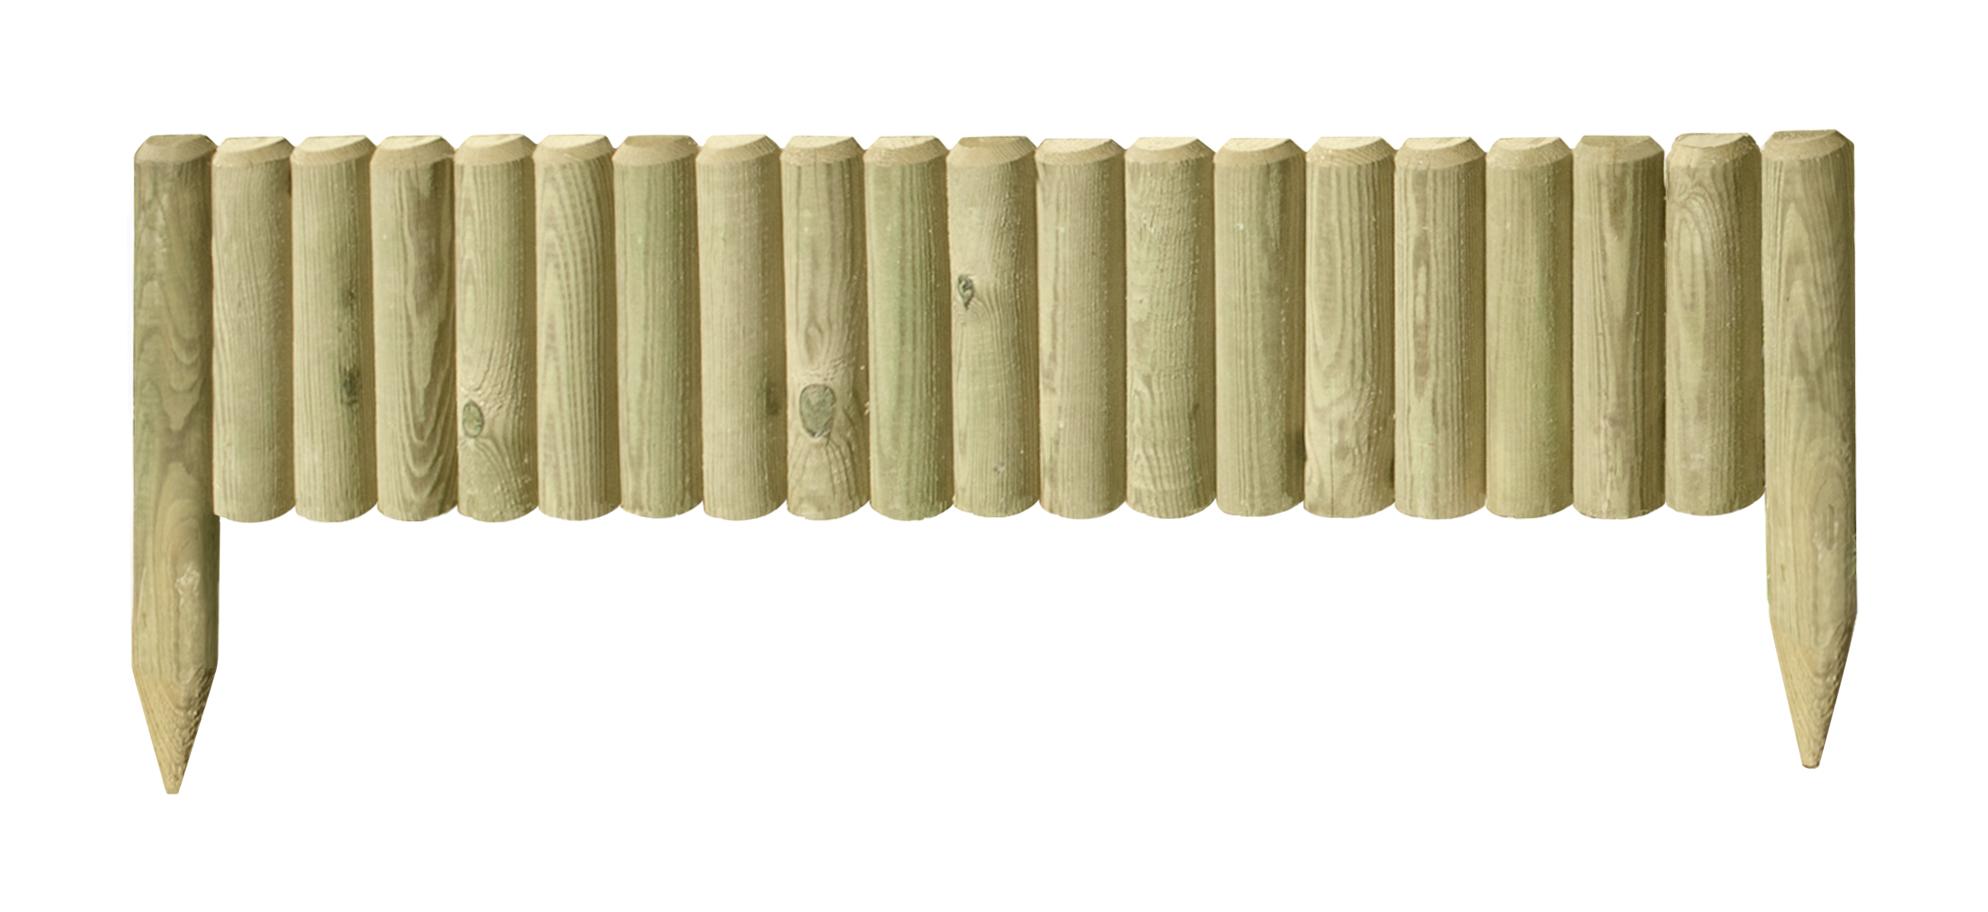 Beetabgrenzung Halbpalisaden kdi  5x20/35x100 cm Bild 1